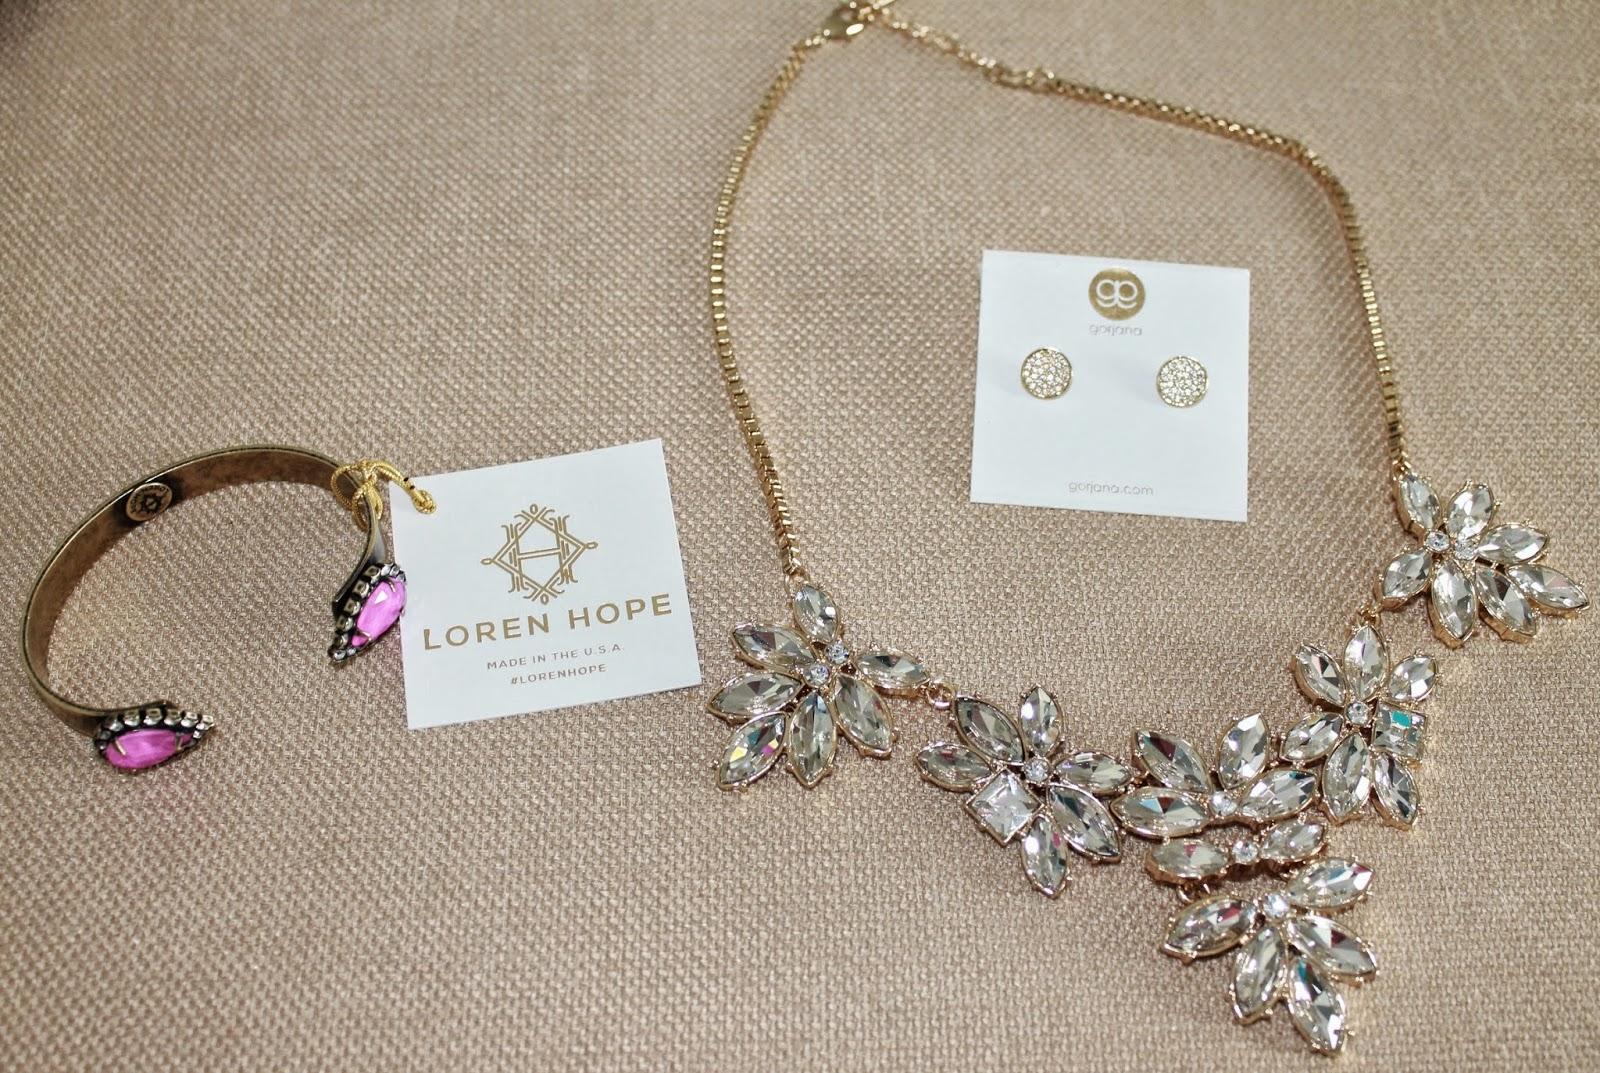 rocksbox 1st month free promo code gorjana designer jewelry